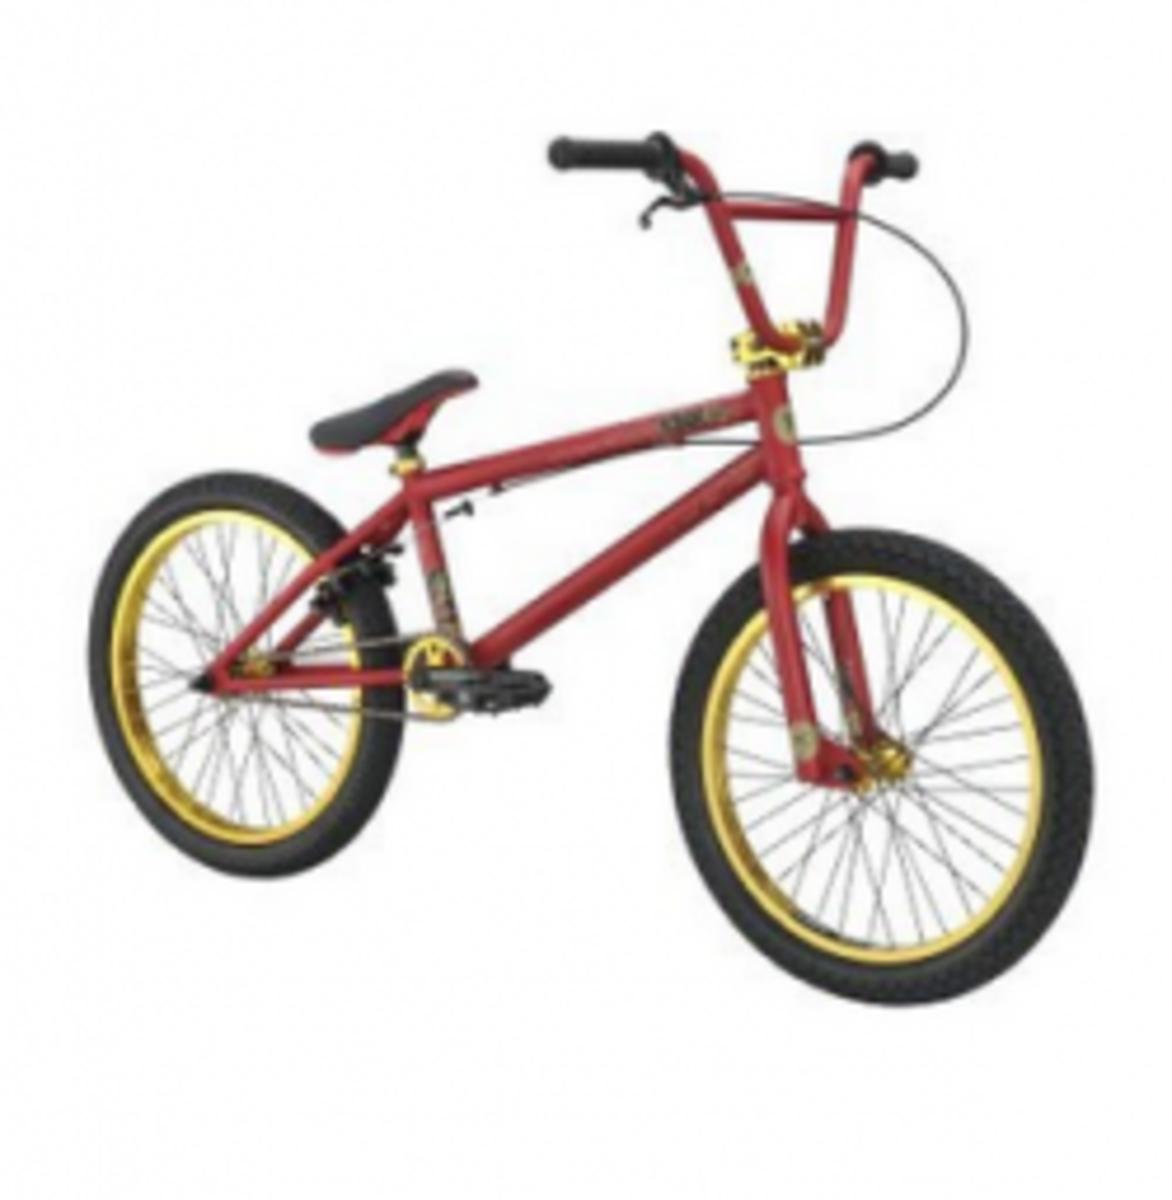 Best Value Bmx Bikes For Kids 2017